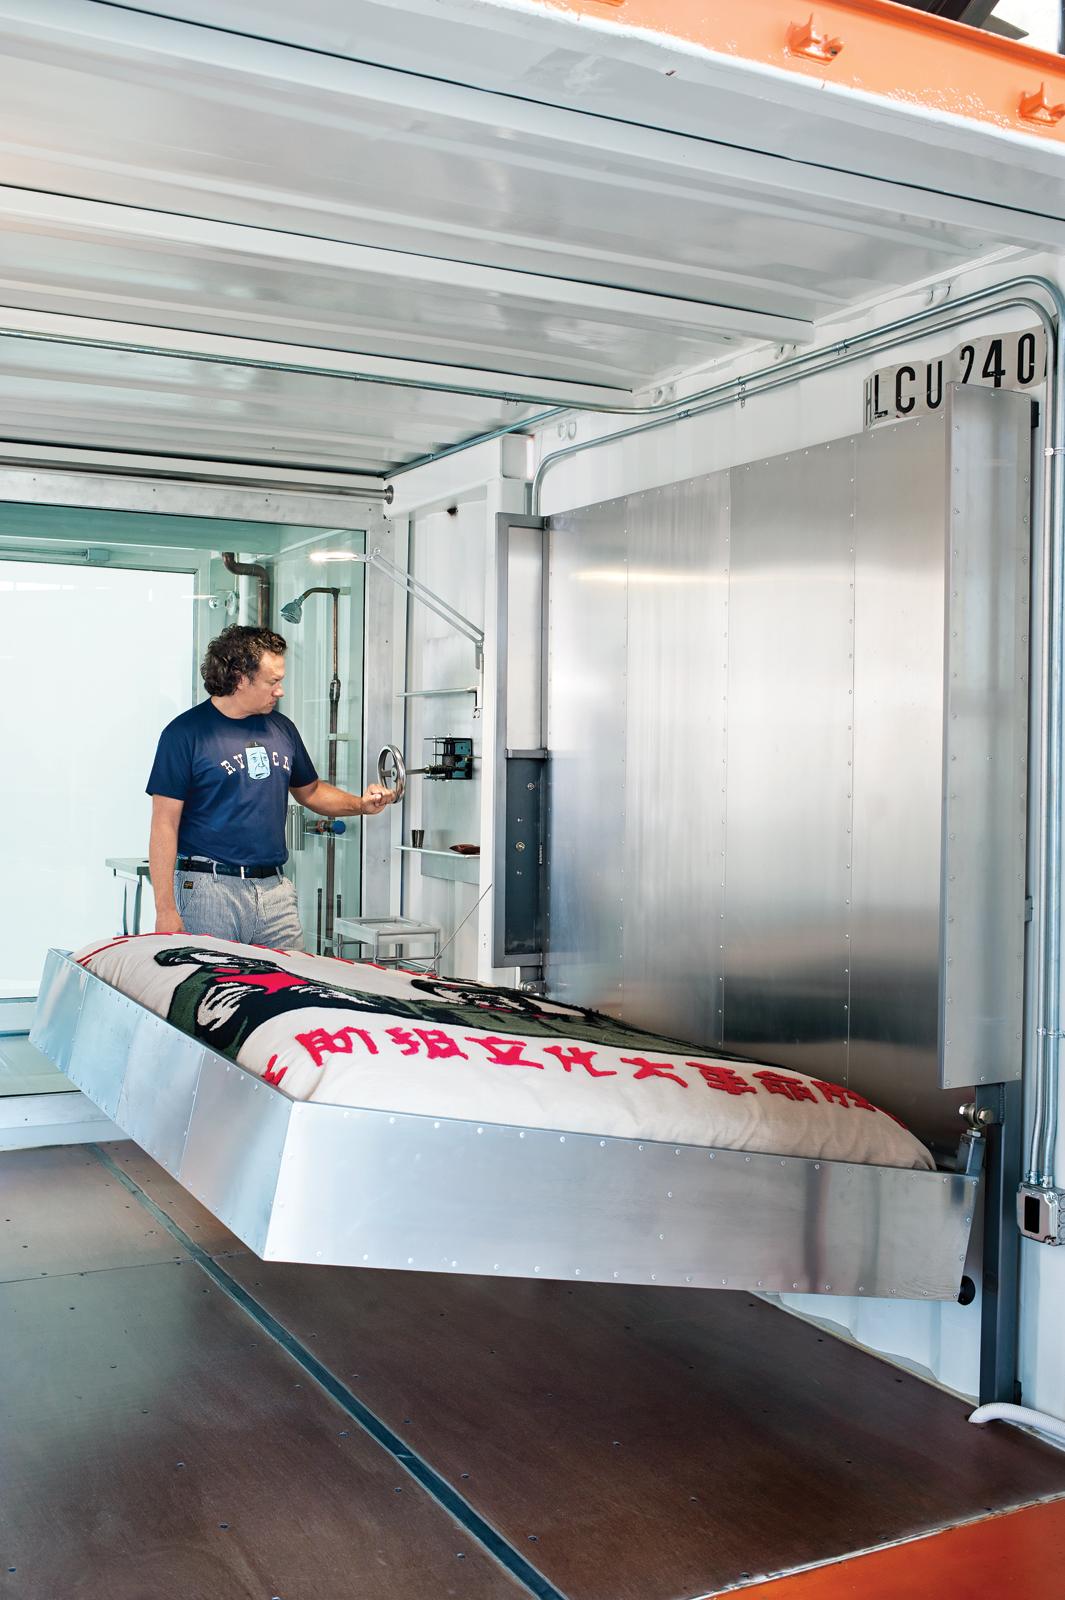 Hand-cranked aluminum bed